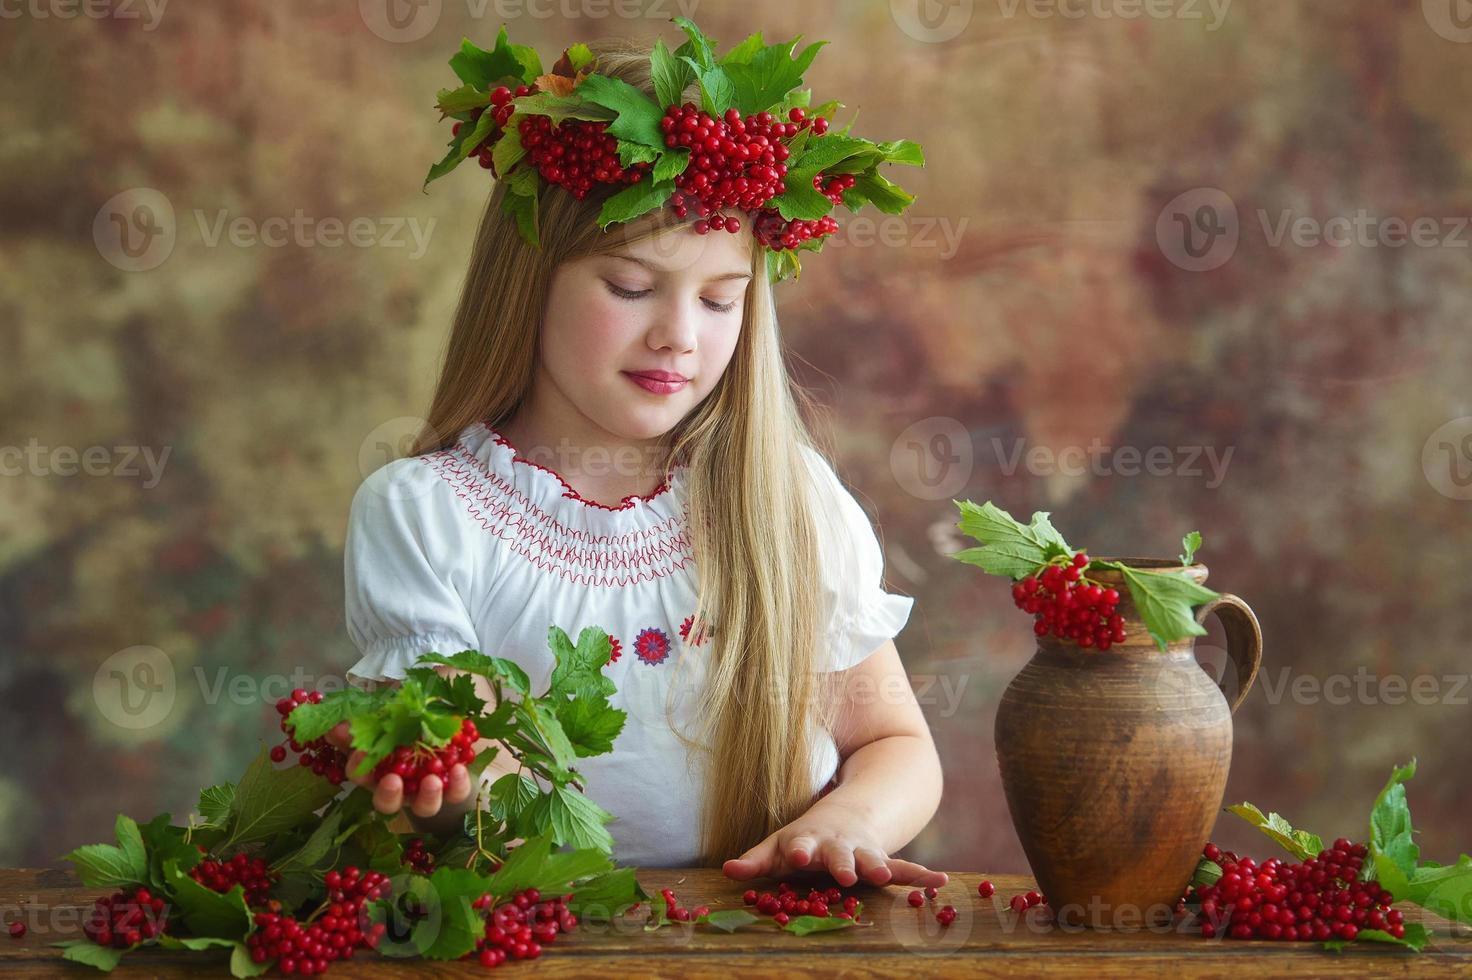 Adorabel niño en corona natural foto